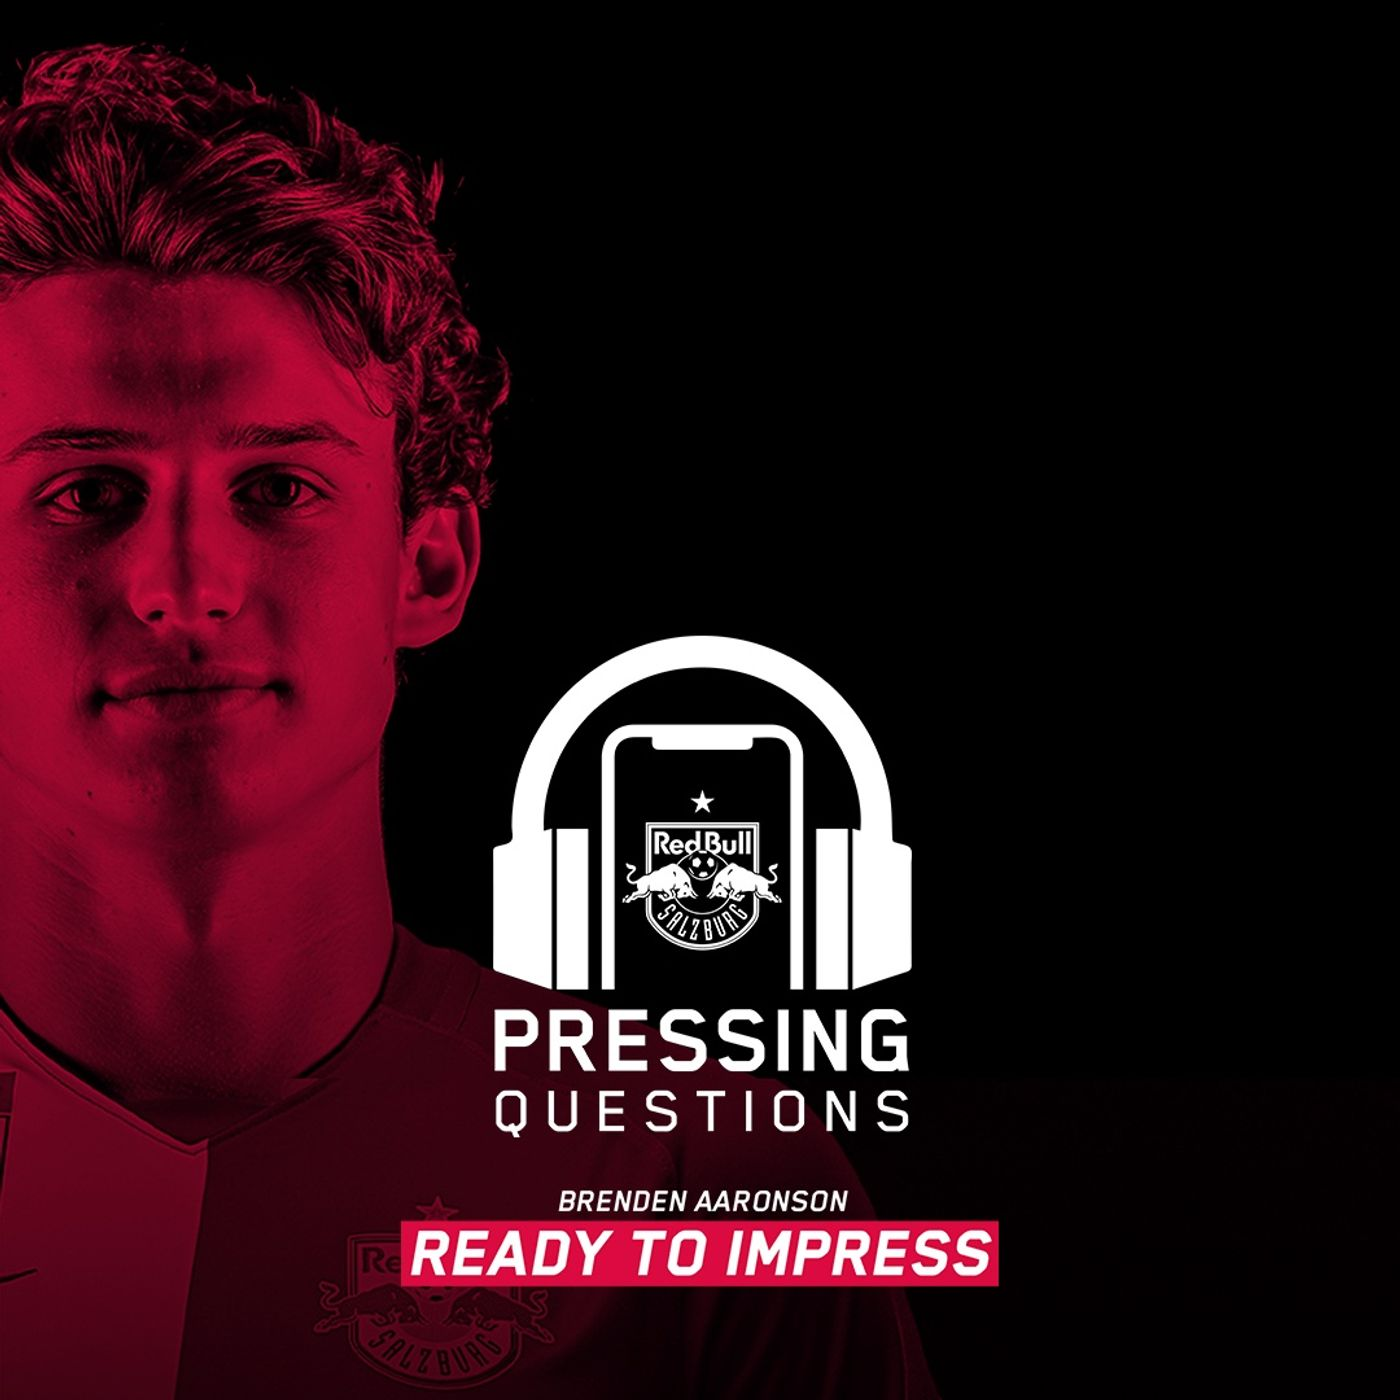 Brenden Aaronson – Ready to impress